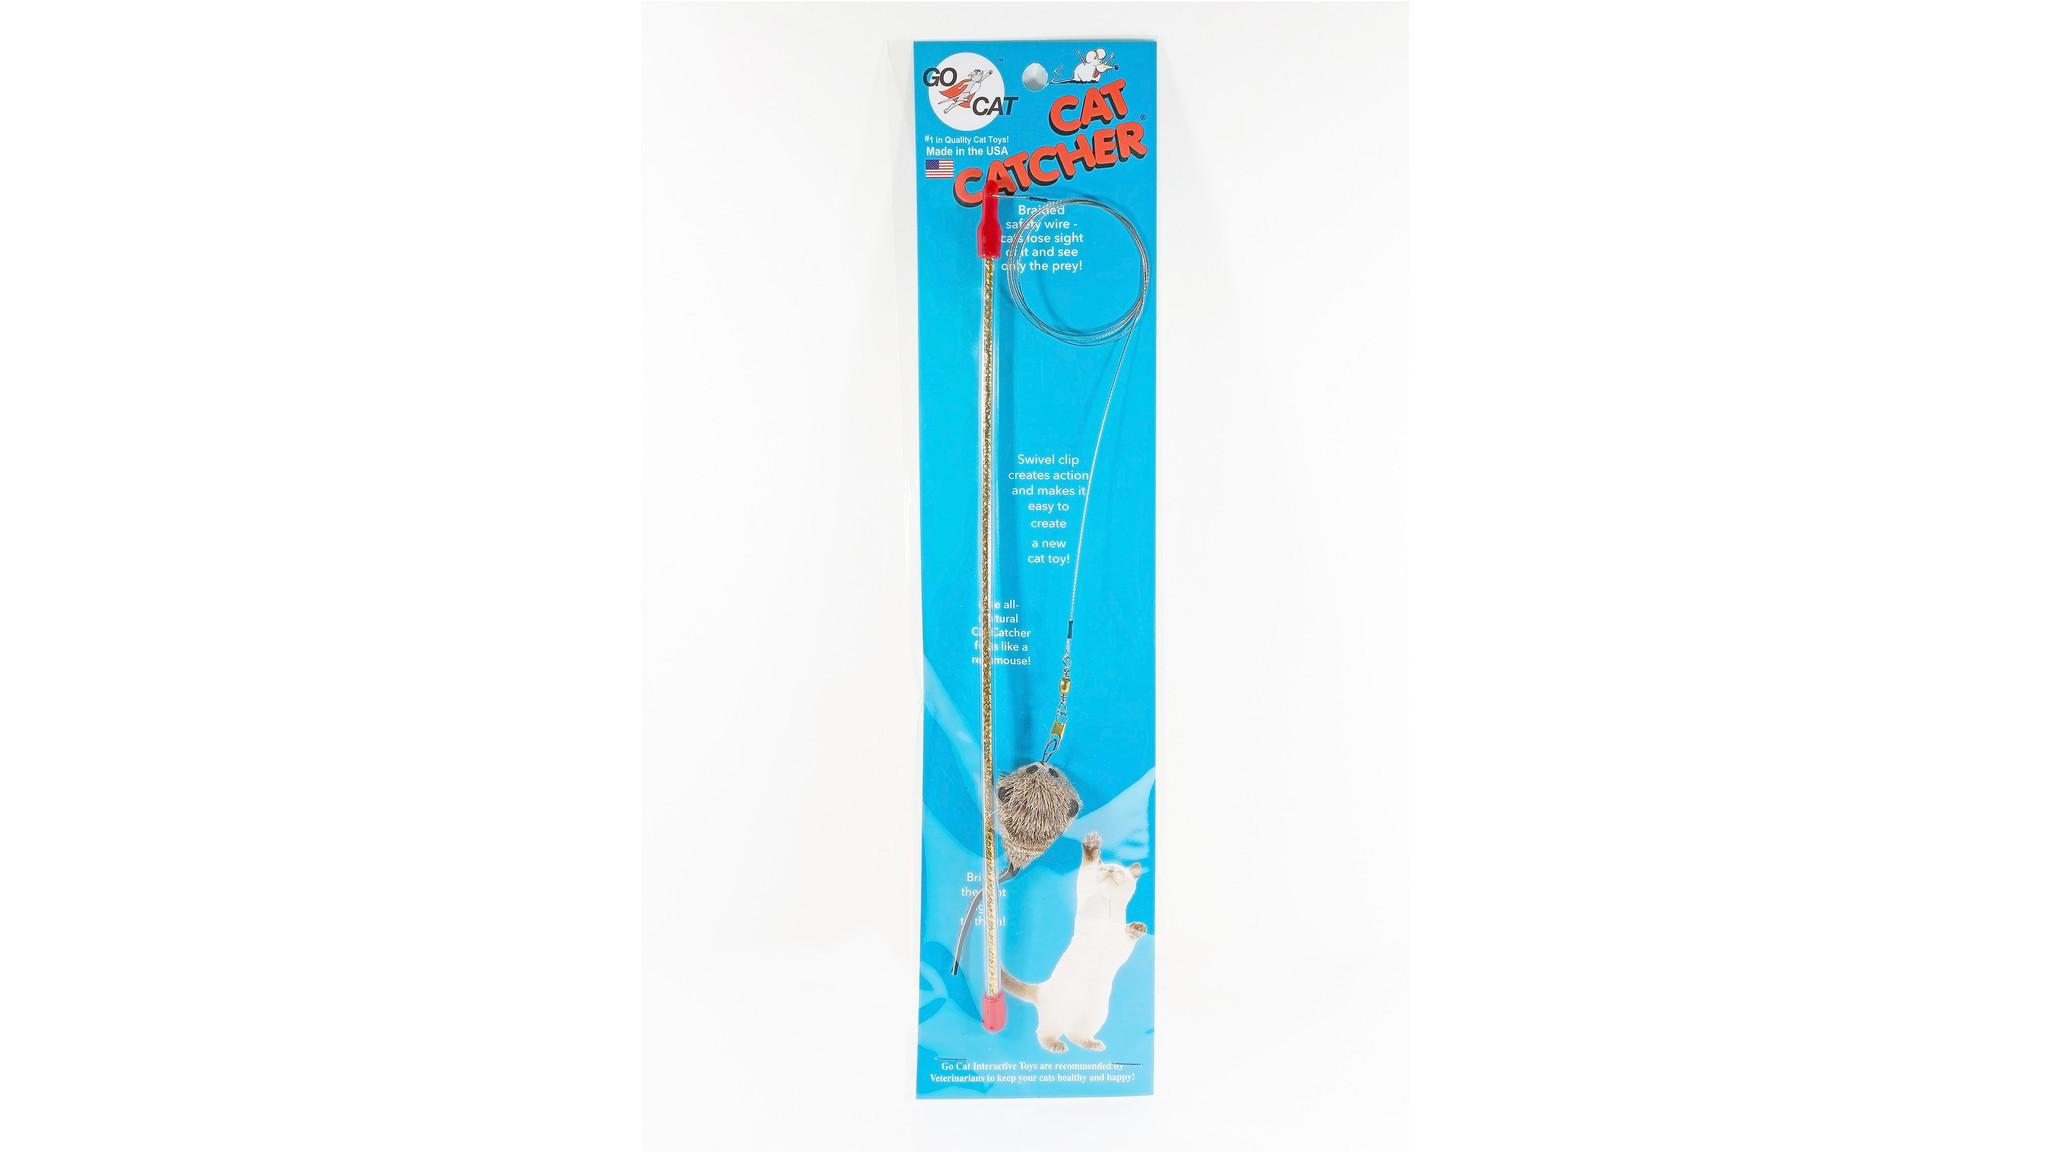 Cat catcher wand toy